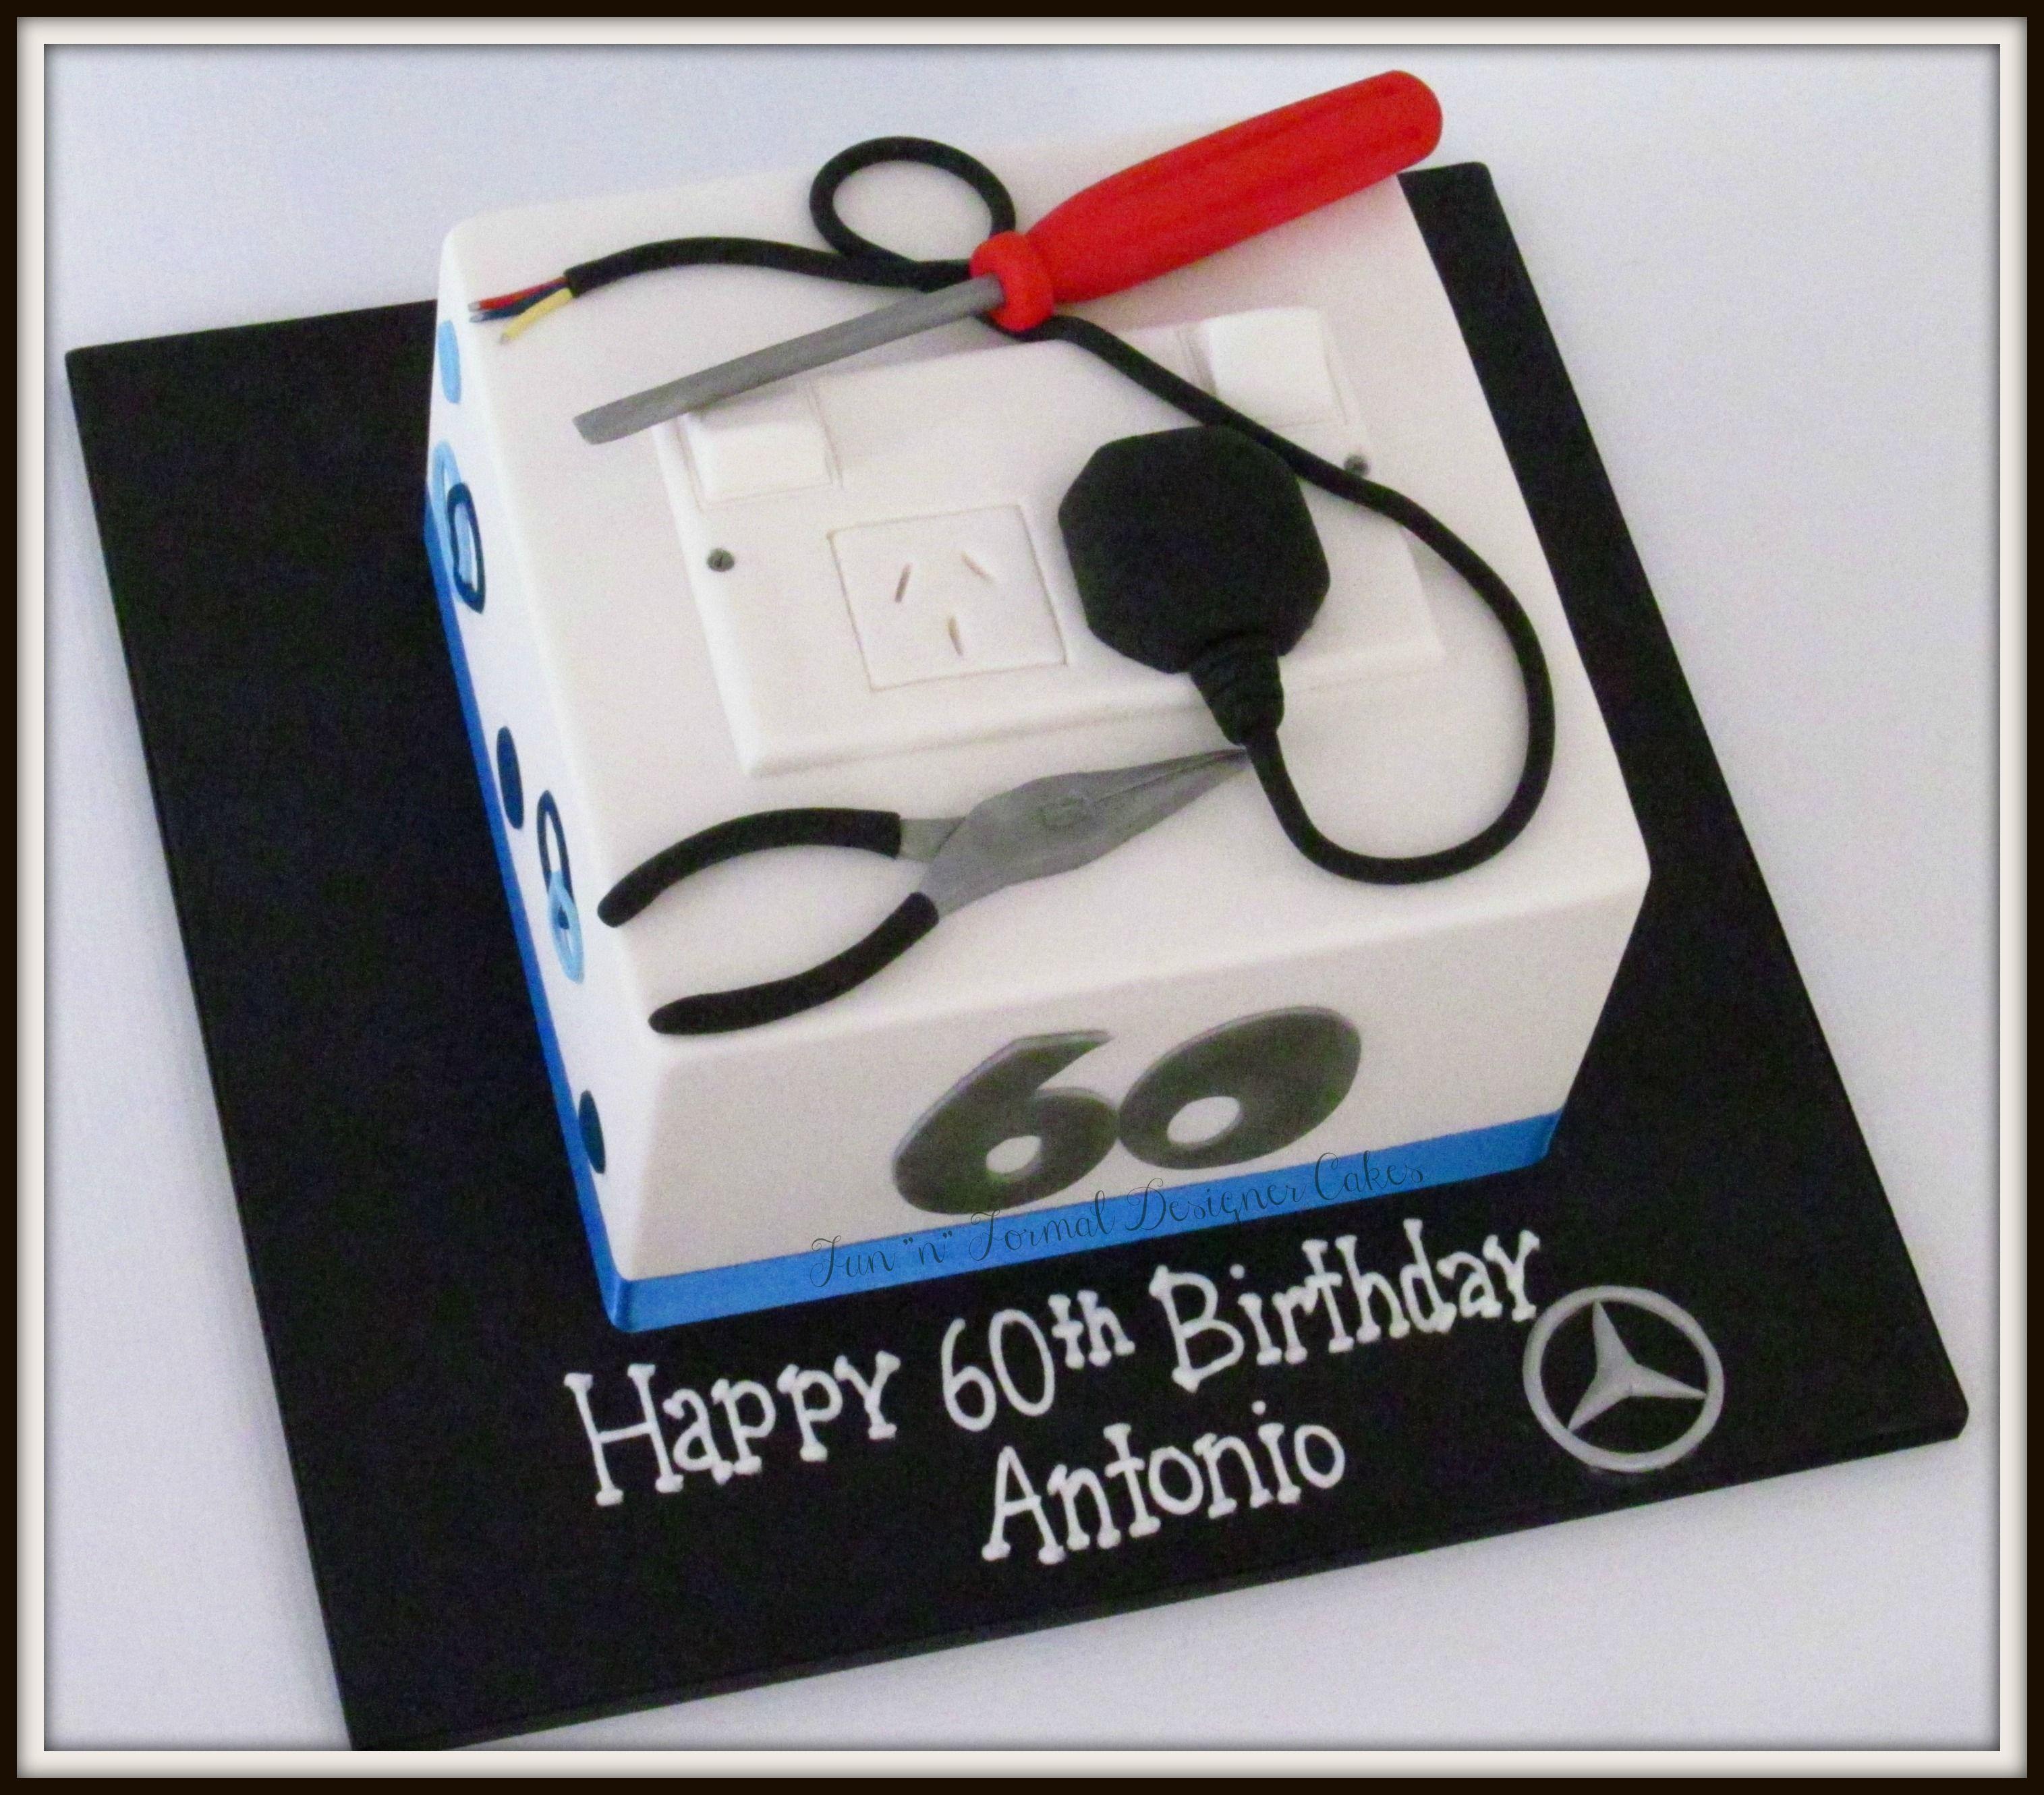 Electrician themed birthday cake. Novelty birthday cakes